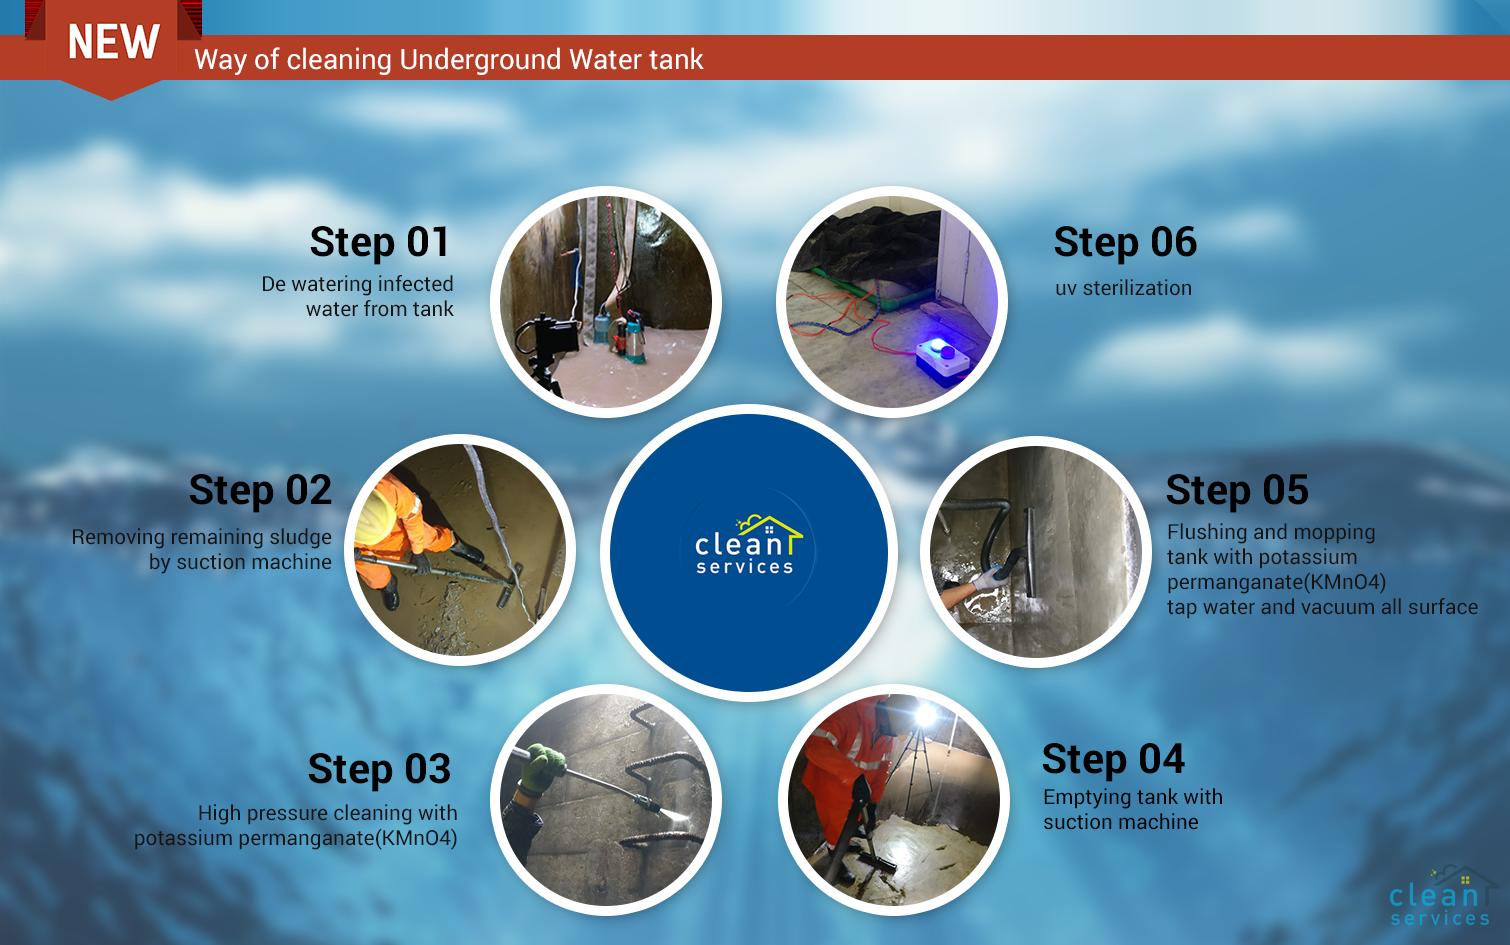 underground water tank cleaning steps to make it hygiene